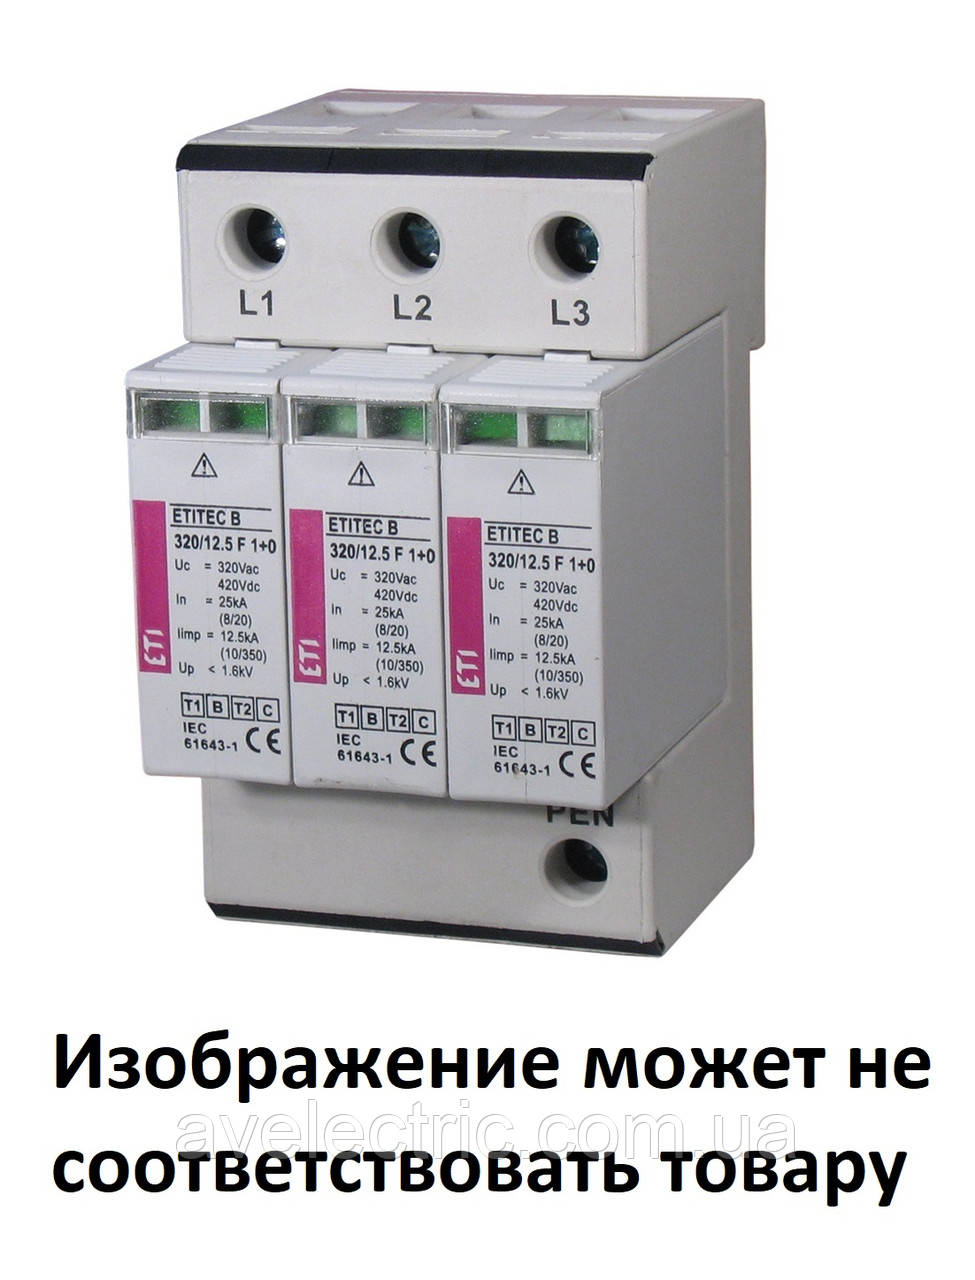 Обмежувач перенапруги ETITEC T WENT 320/25 (2+0, 4p, TNC-S)